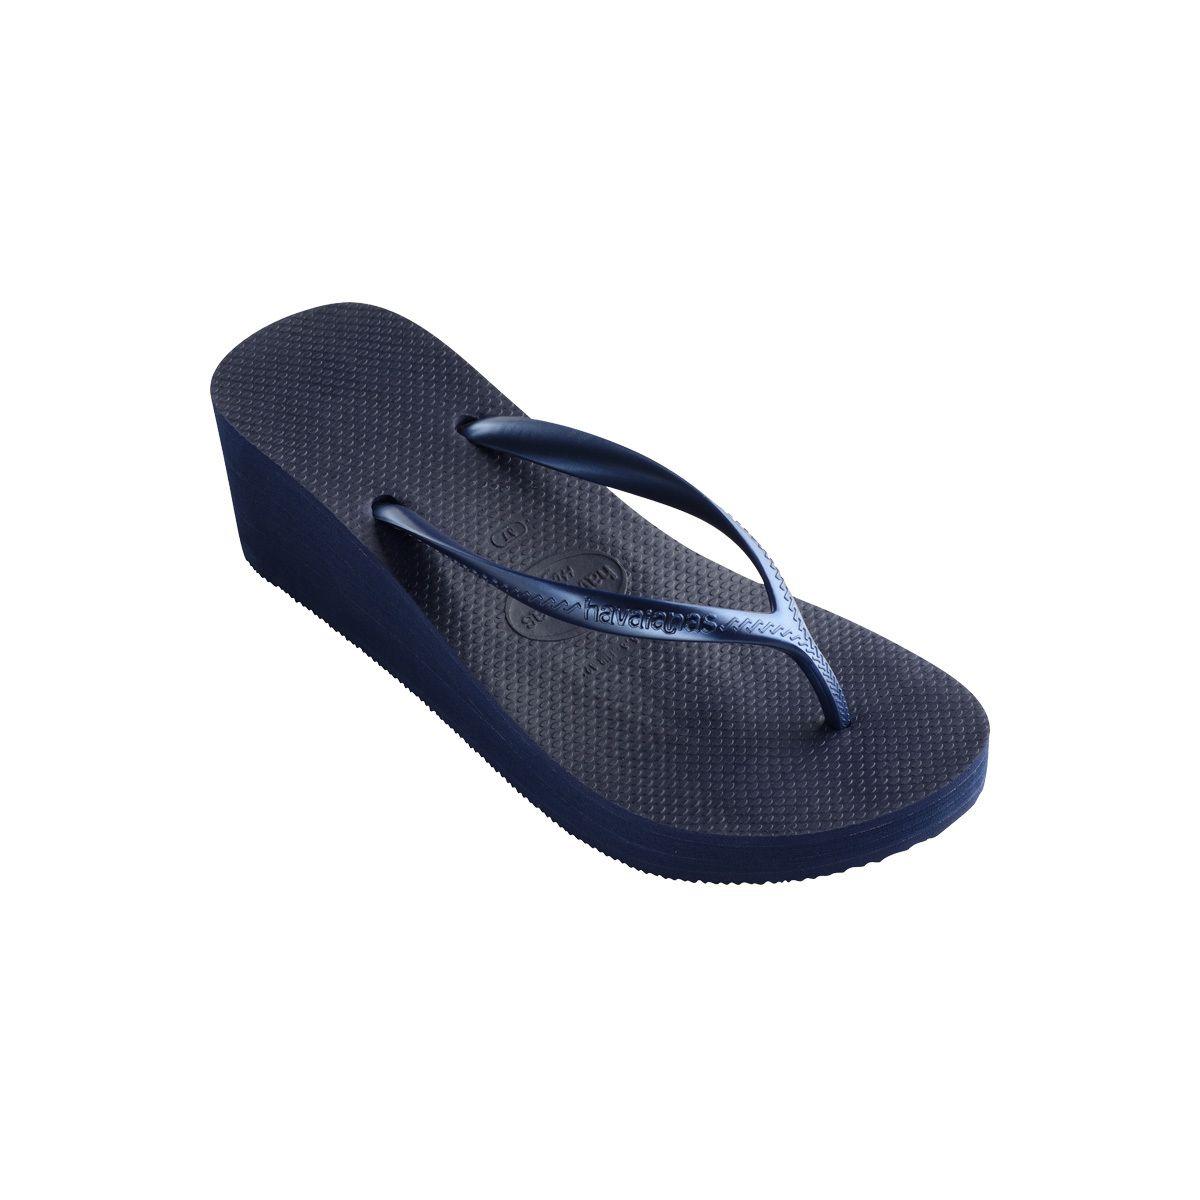 1dd0f77d Women's Navy Blue High Fashion Wedge Sandal - Havaianas | Swimwear ...